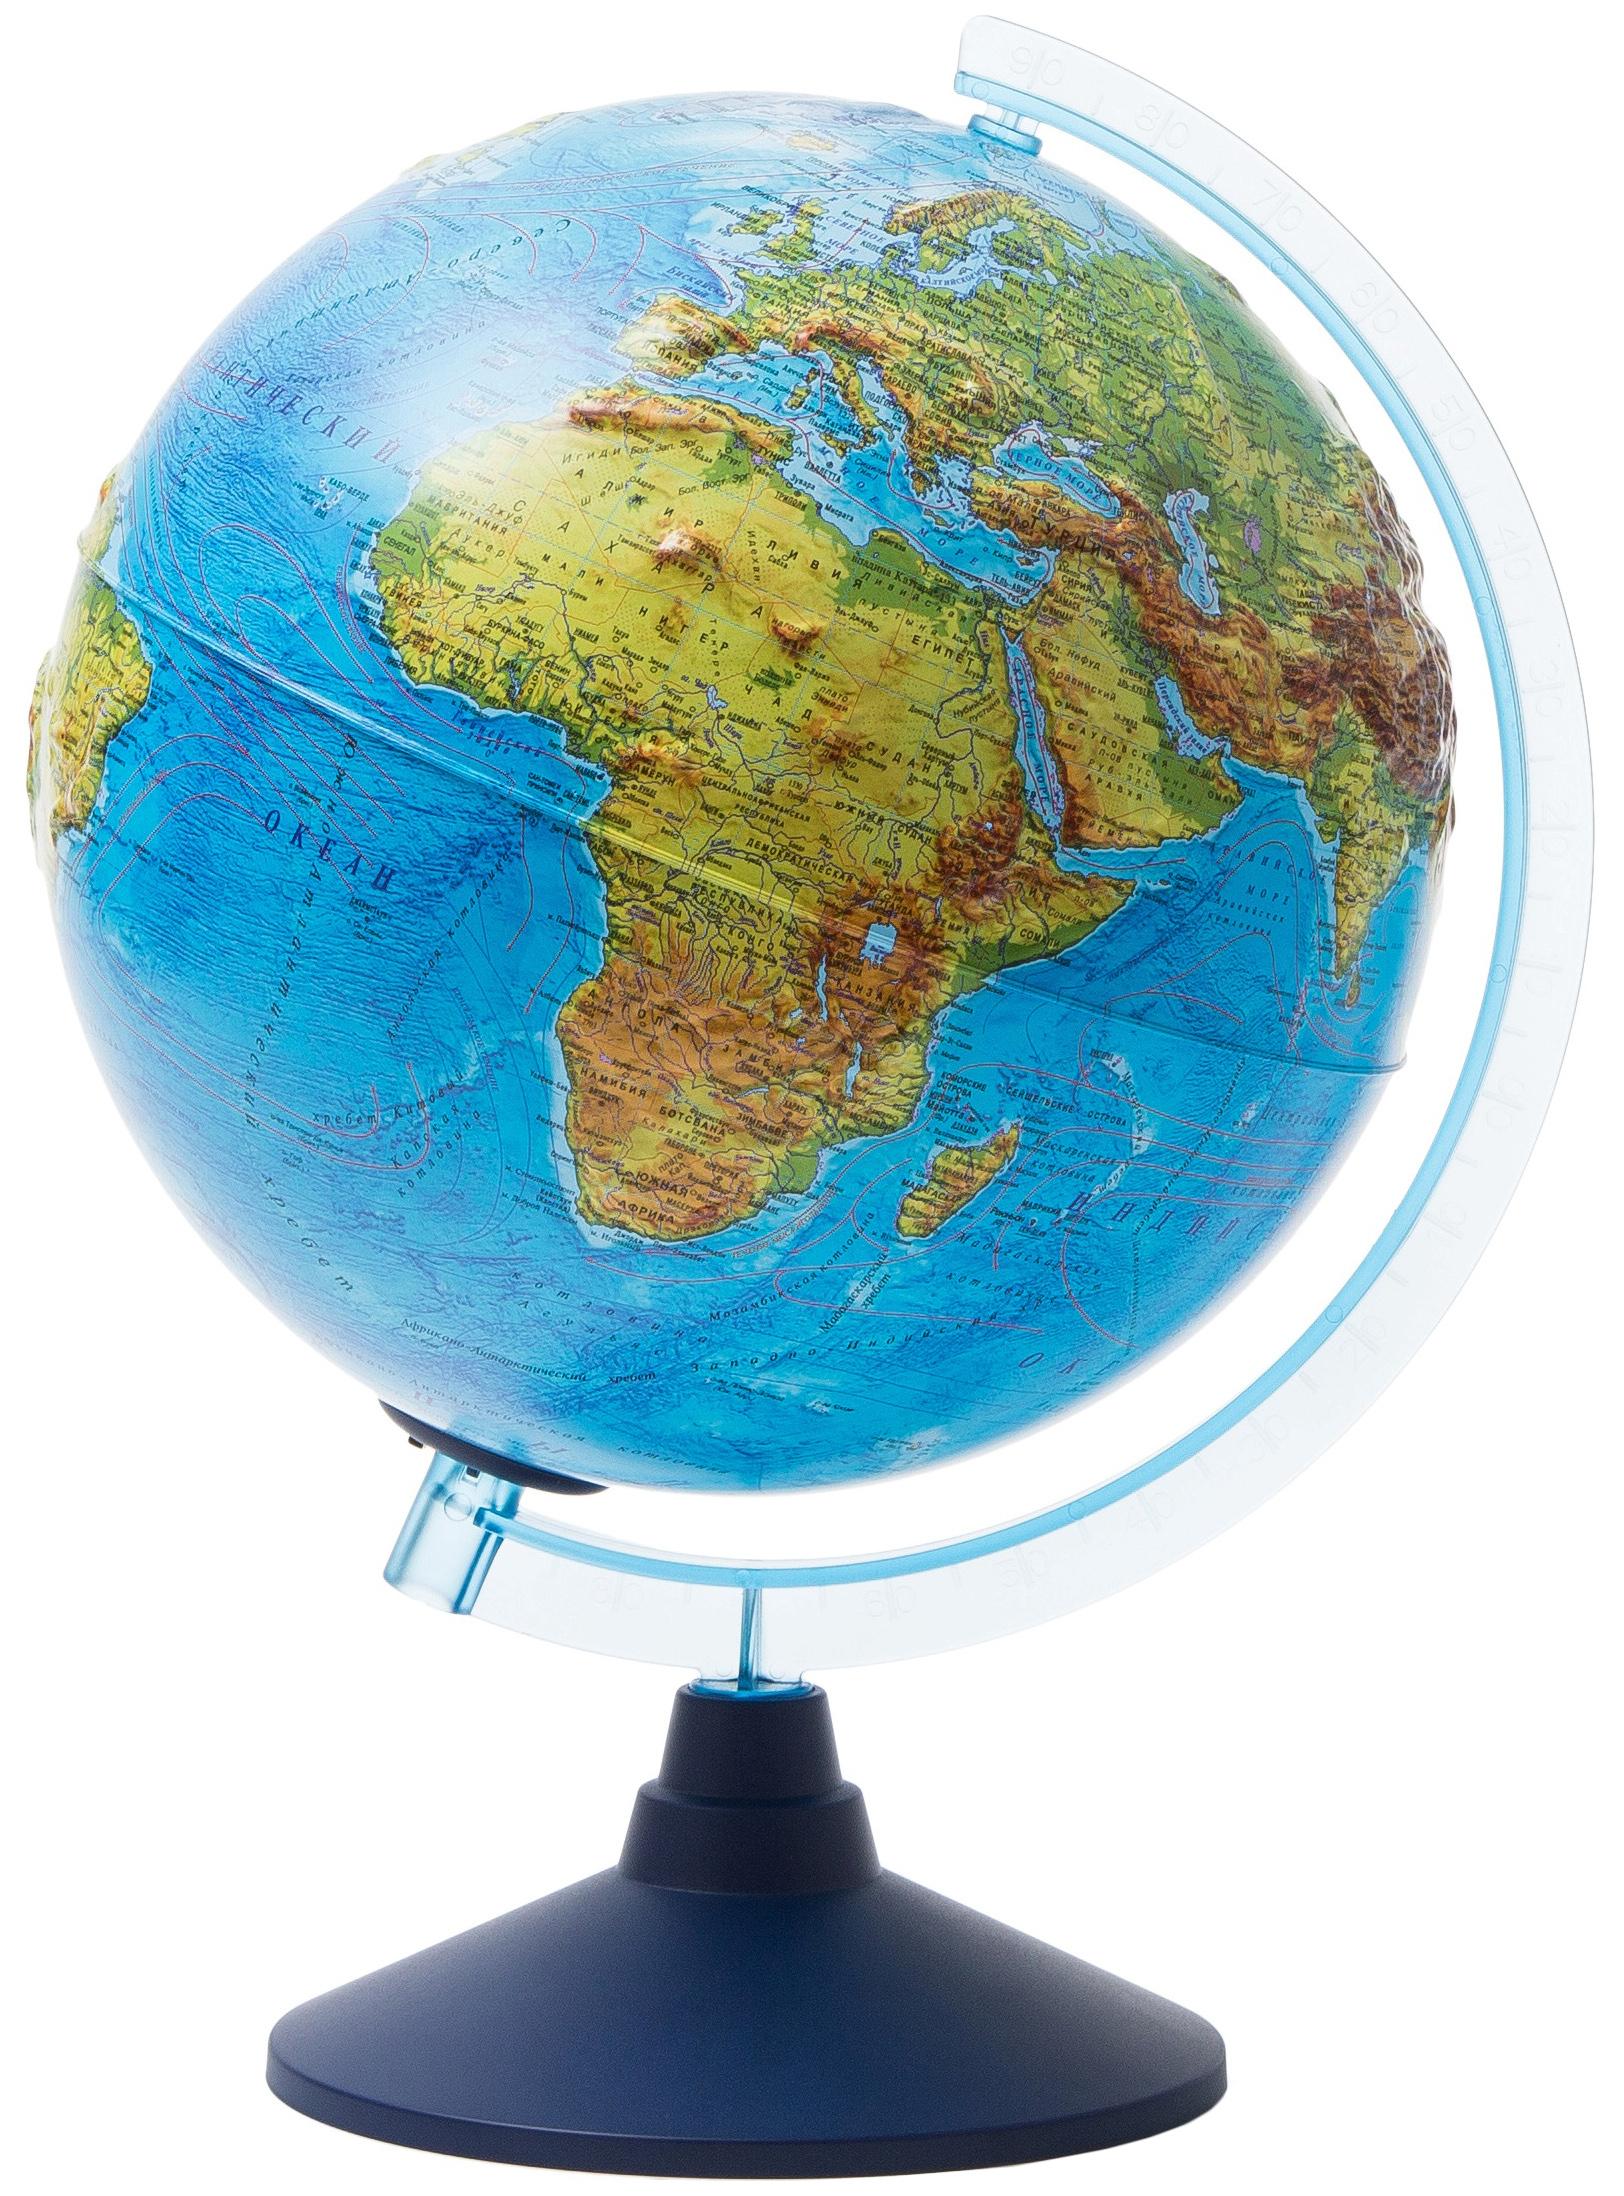 картинка карт земного шара актрисы удача